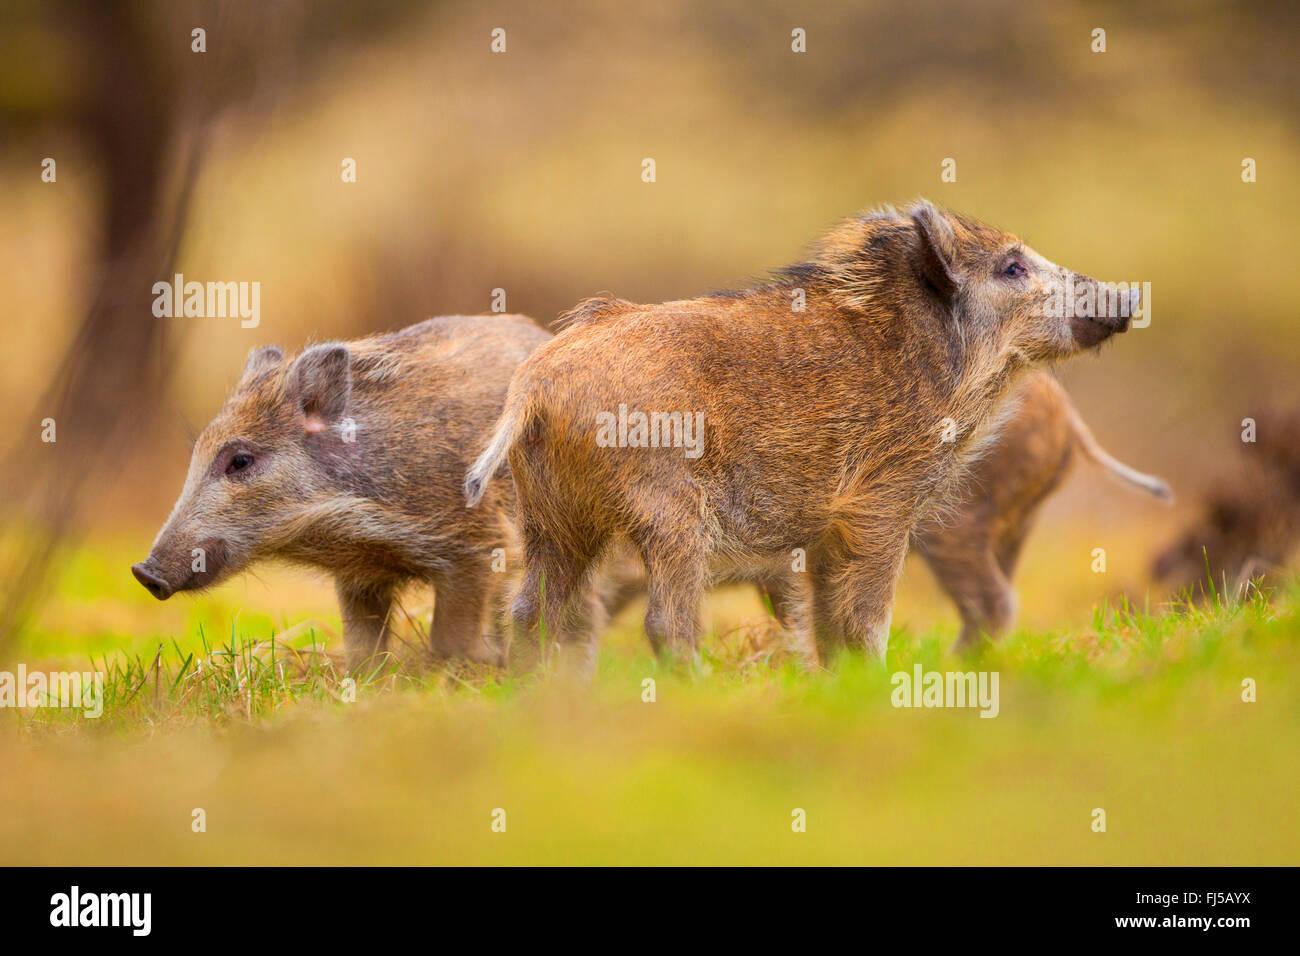 wild boar, pig, wild boar (Sus scrofa), runts, Germany, Rhineland-Palatinate - Stock Image